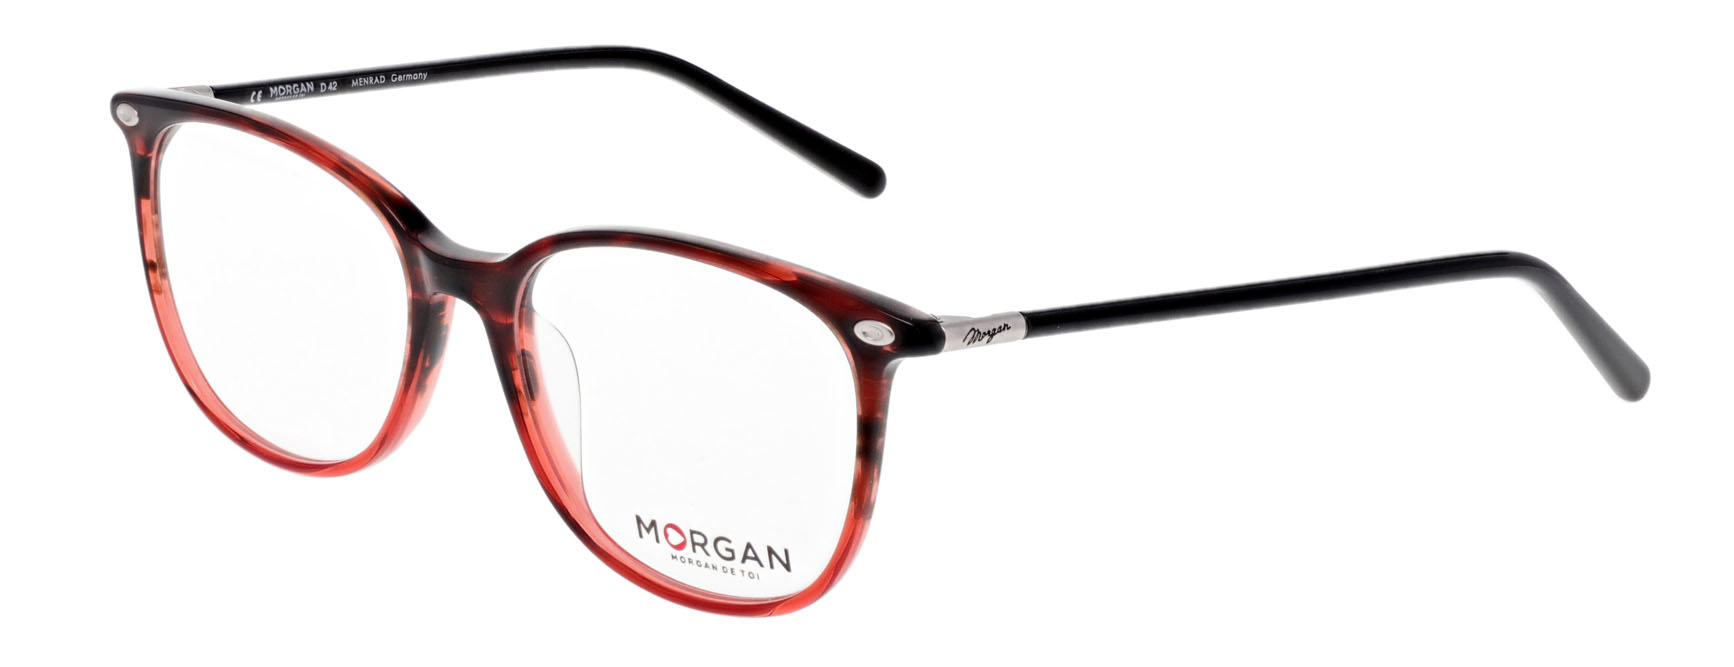 Morgan 202024 4396